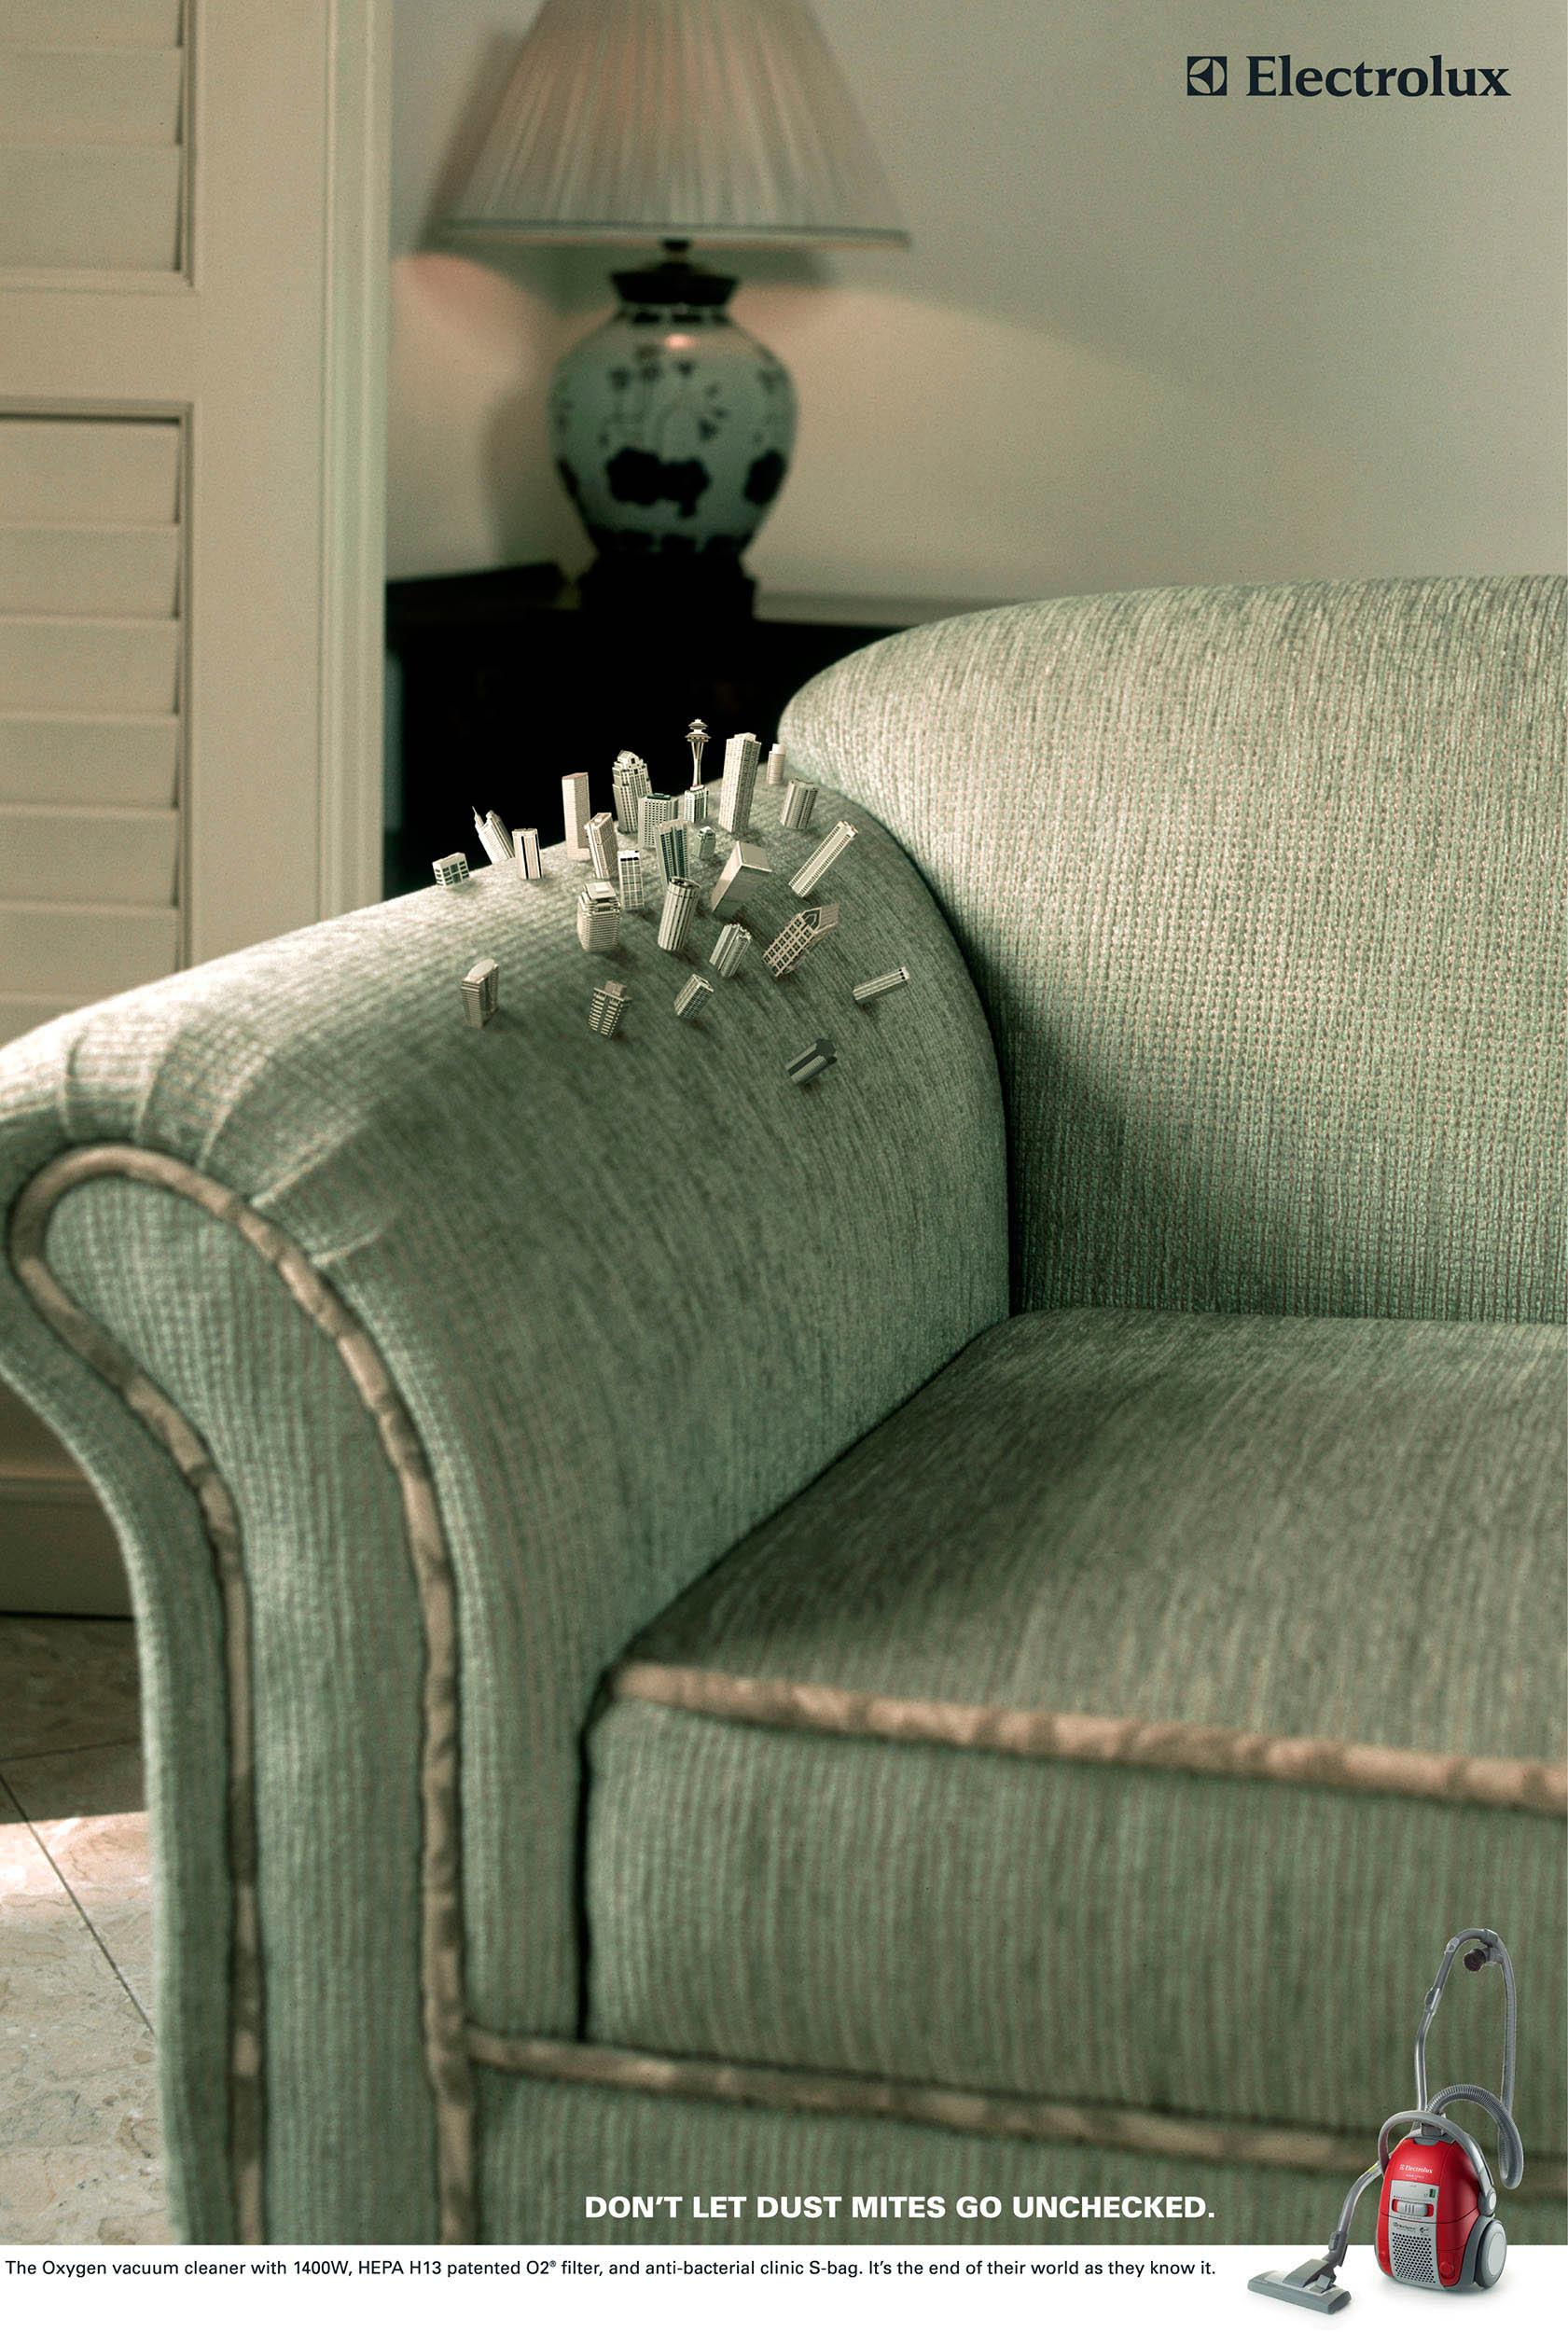 electrolux_sofa.jpg